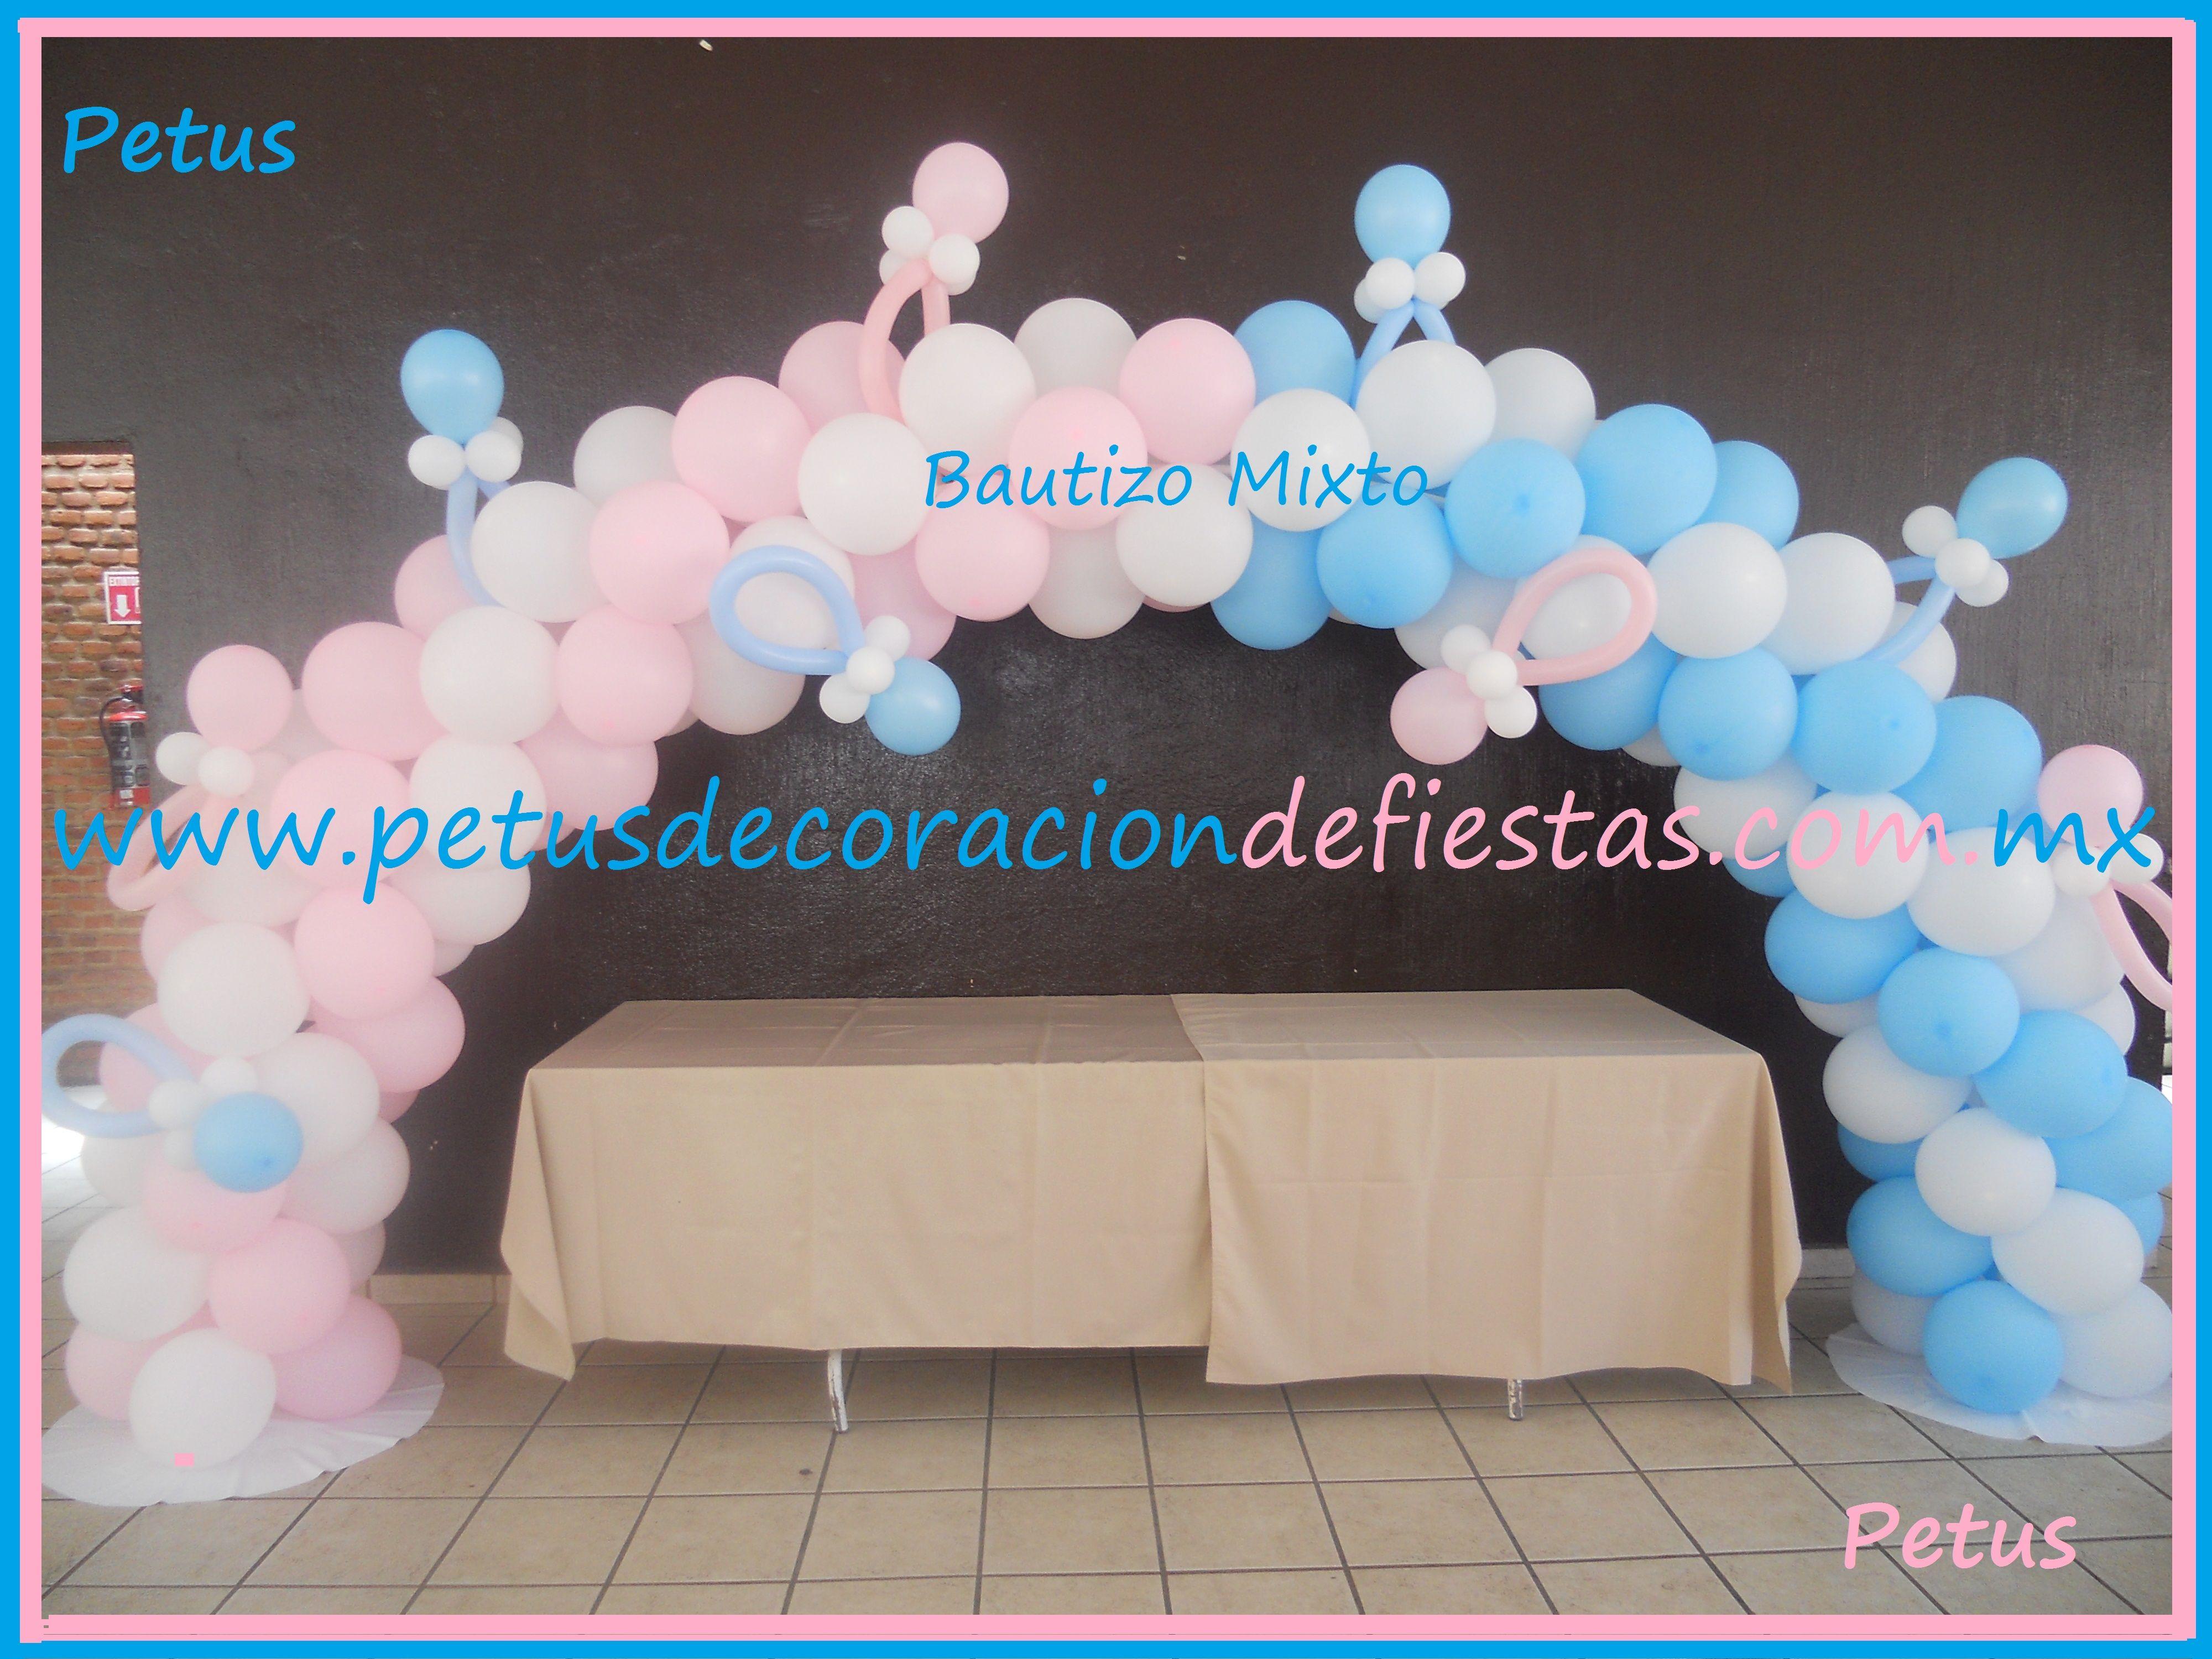 Arco de Globos mixto para Bautizo de niña y niño.  Bautizo niño